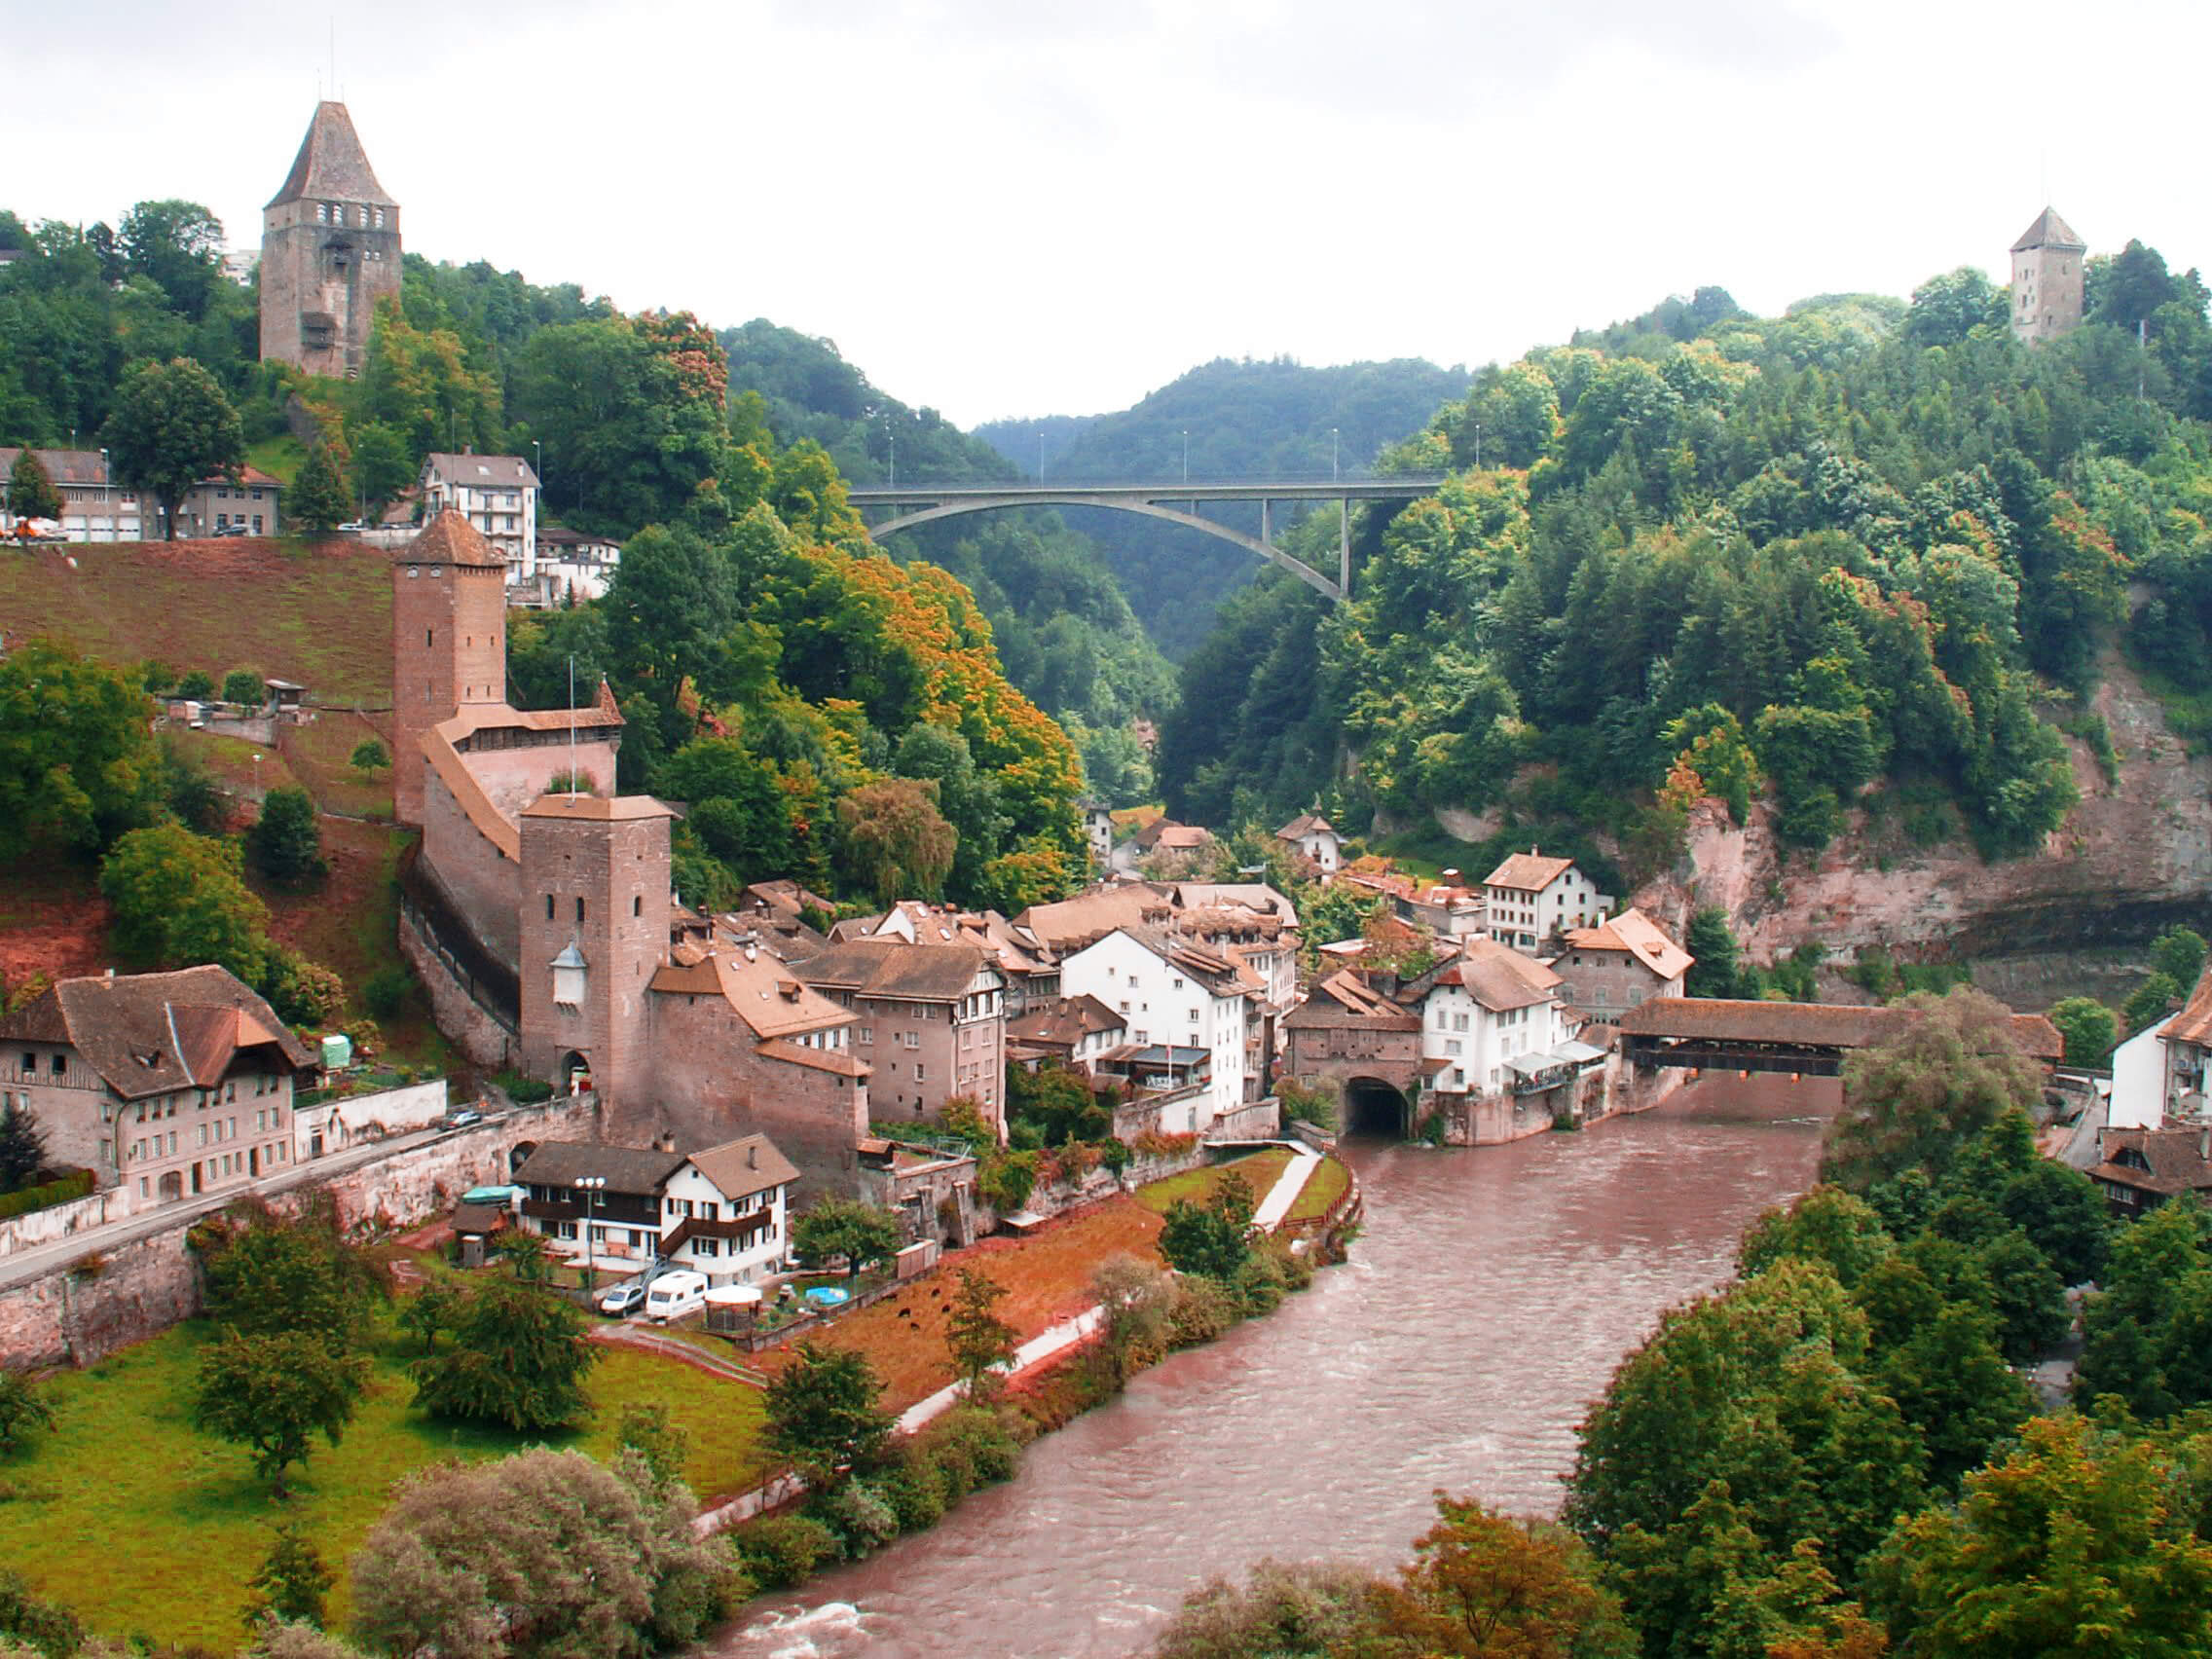 River Saane, Switzerland